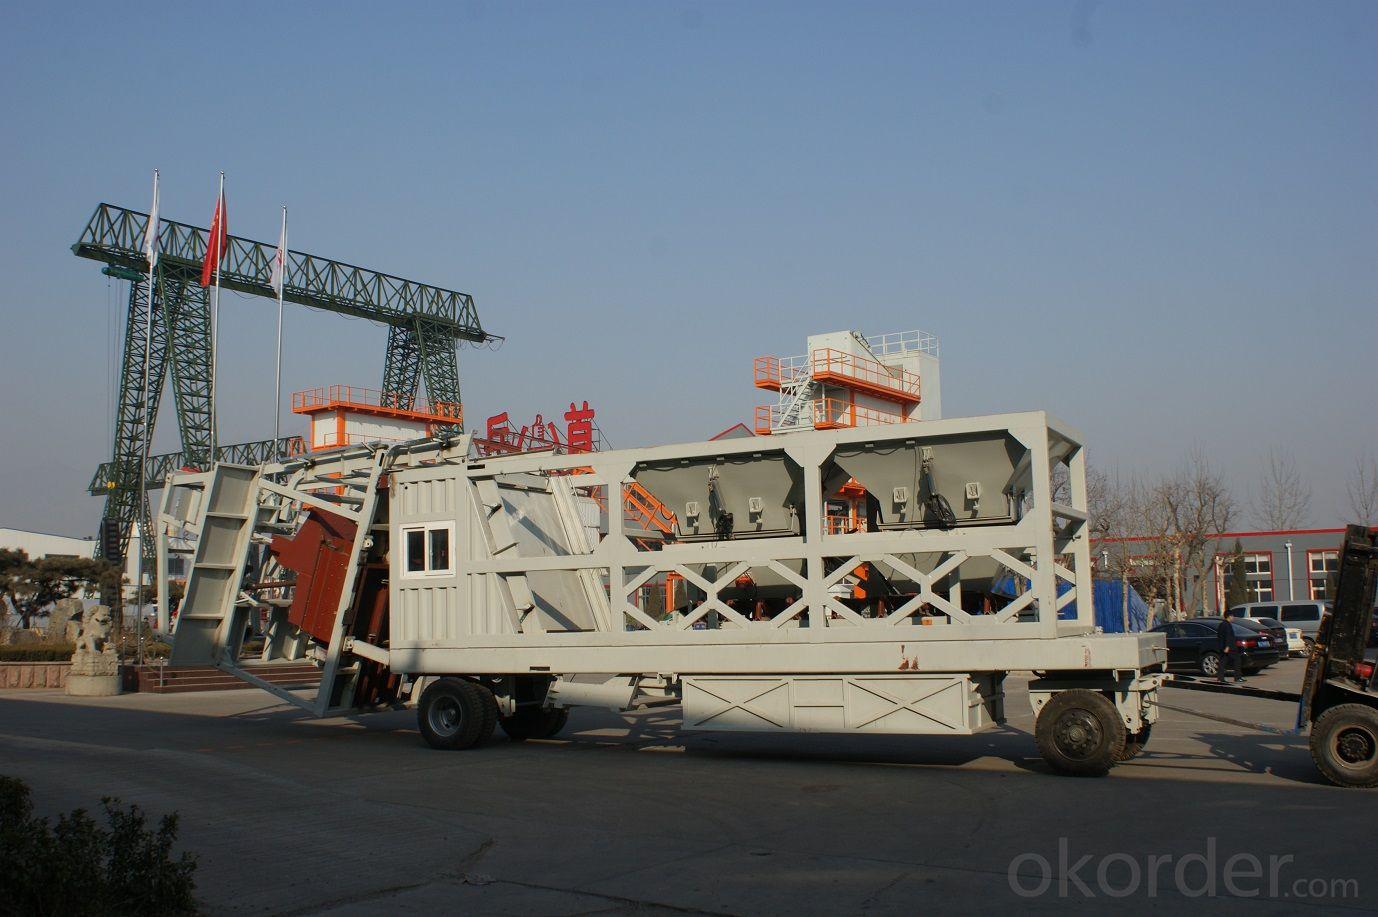 mobile concrete mixing plant,HZSY25,HZSY35,HZSY50,HZSY60